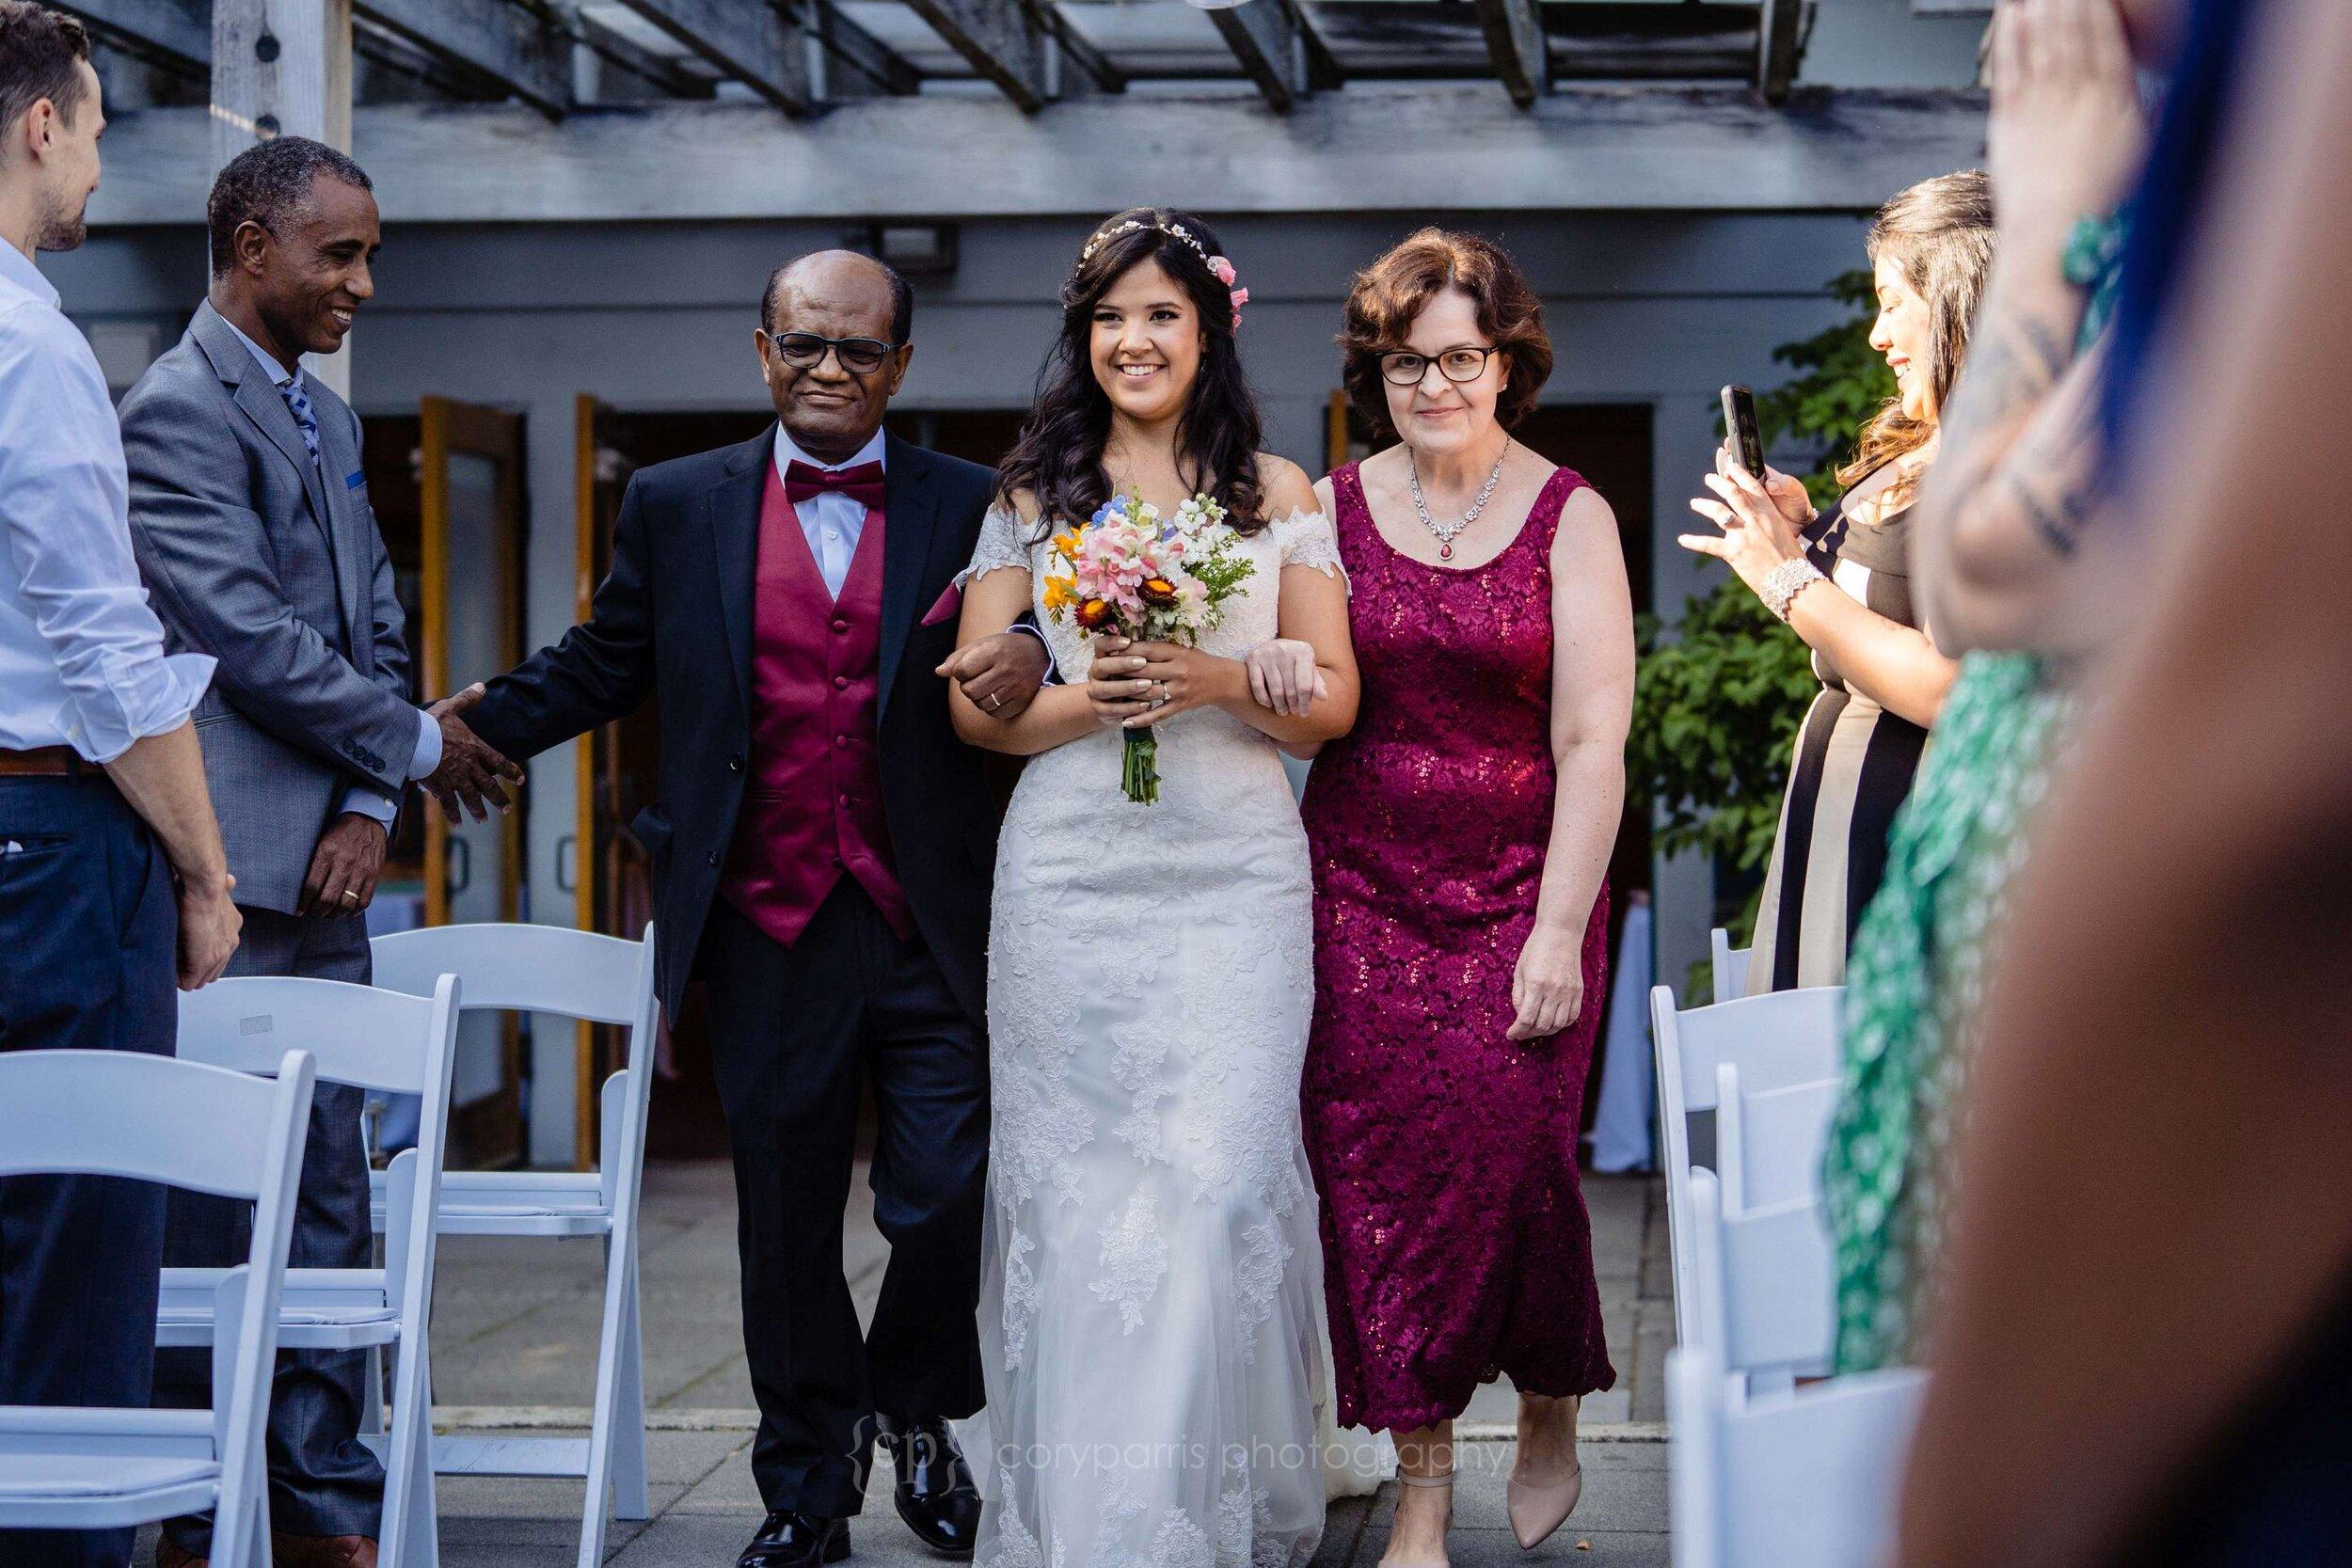 363-washington-park-arboretum-wedding.jpg